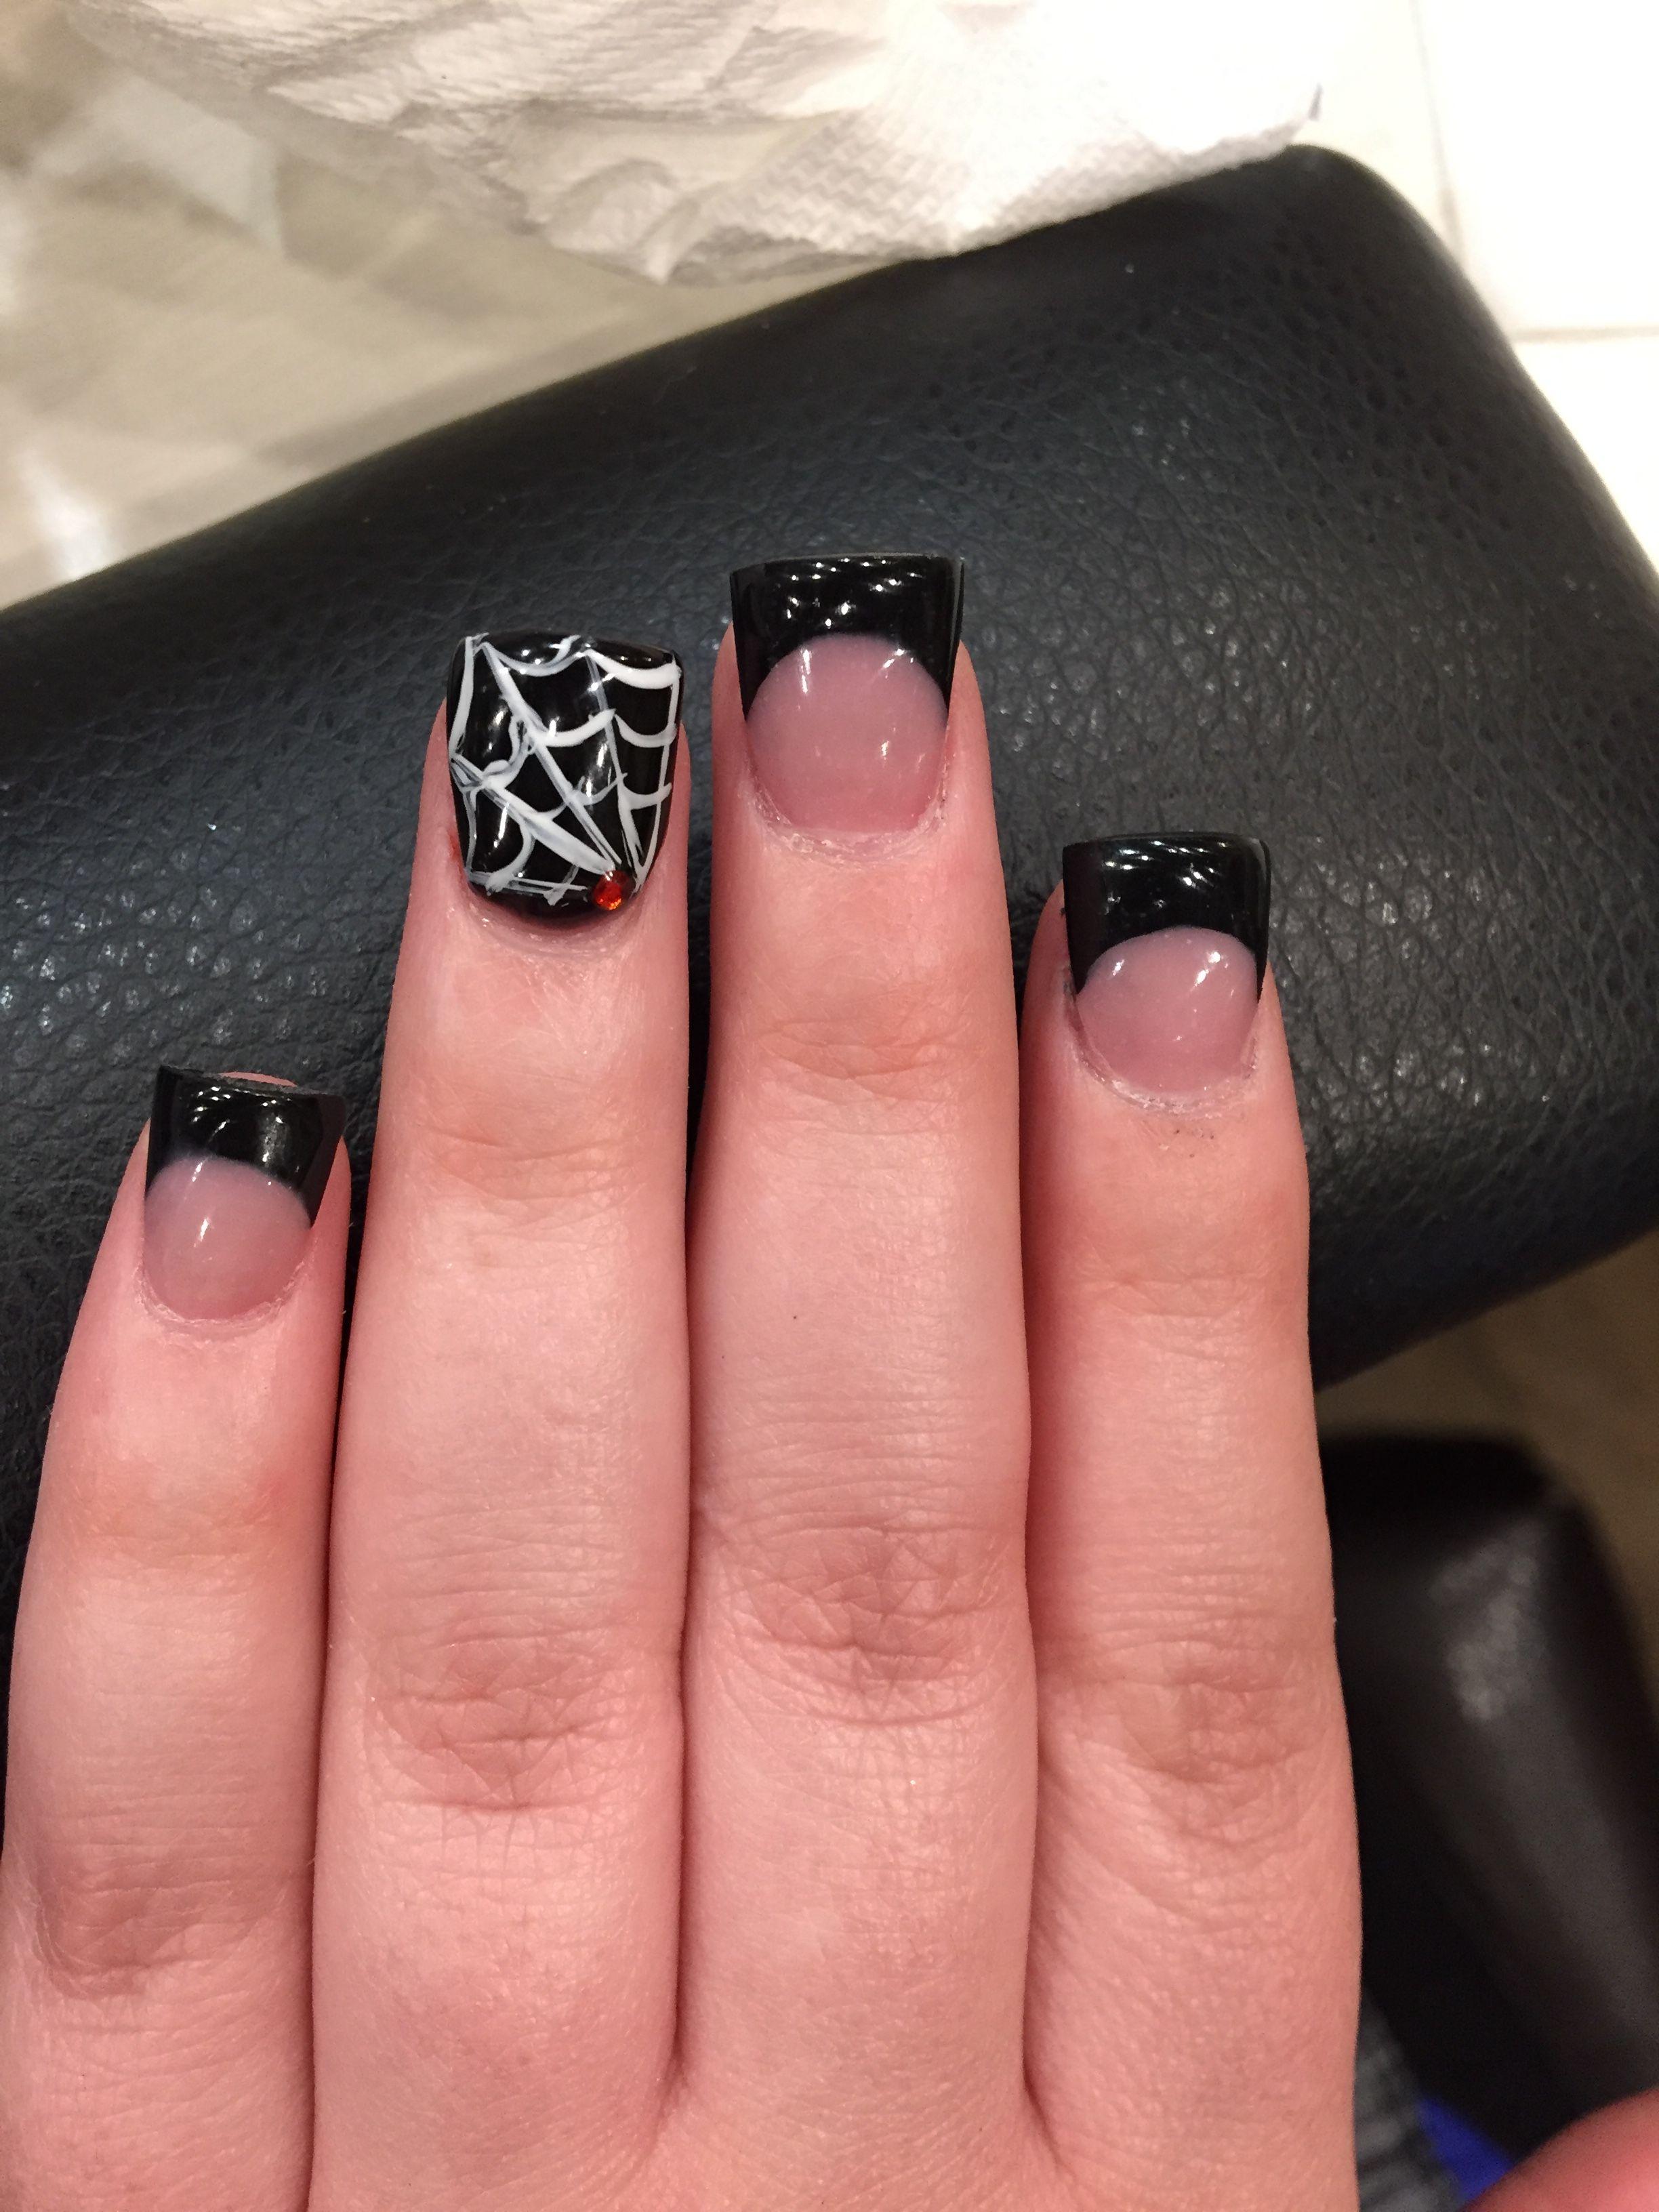 Halloween nails by Britney at Nail forum Valencia California   Nails ...